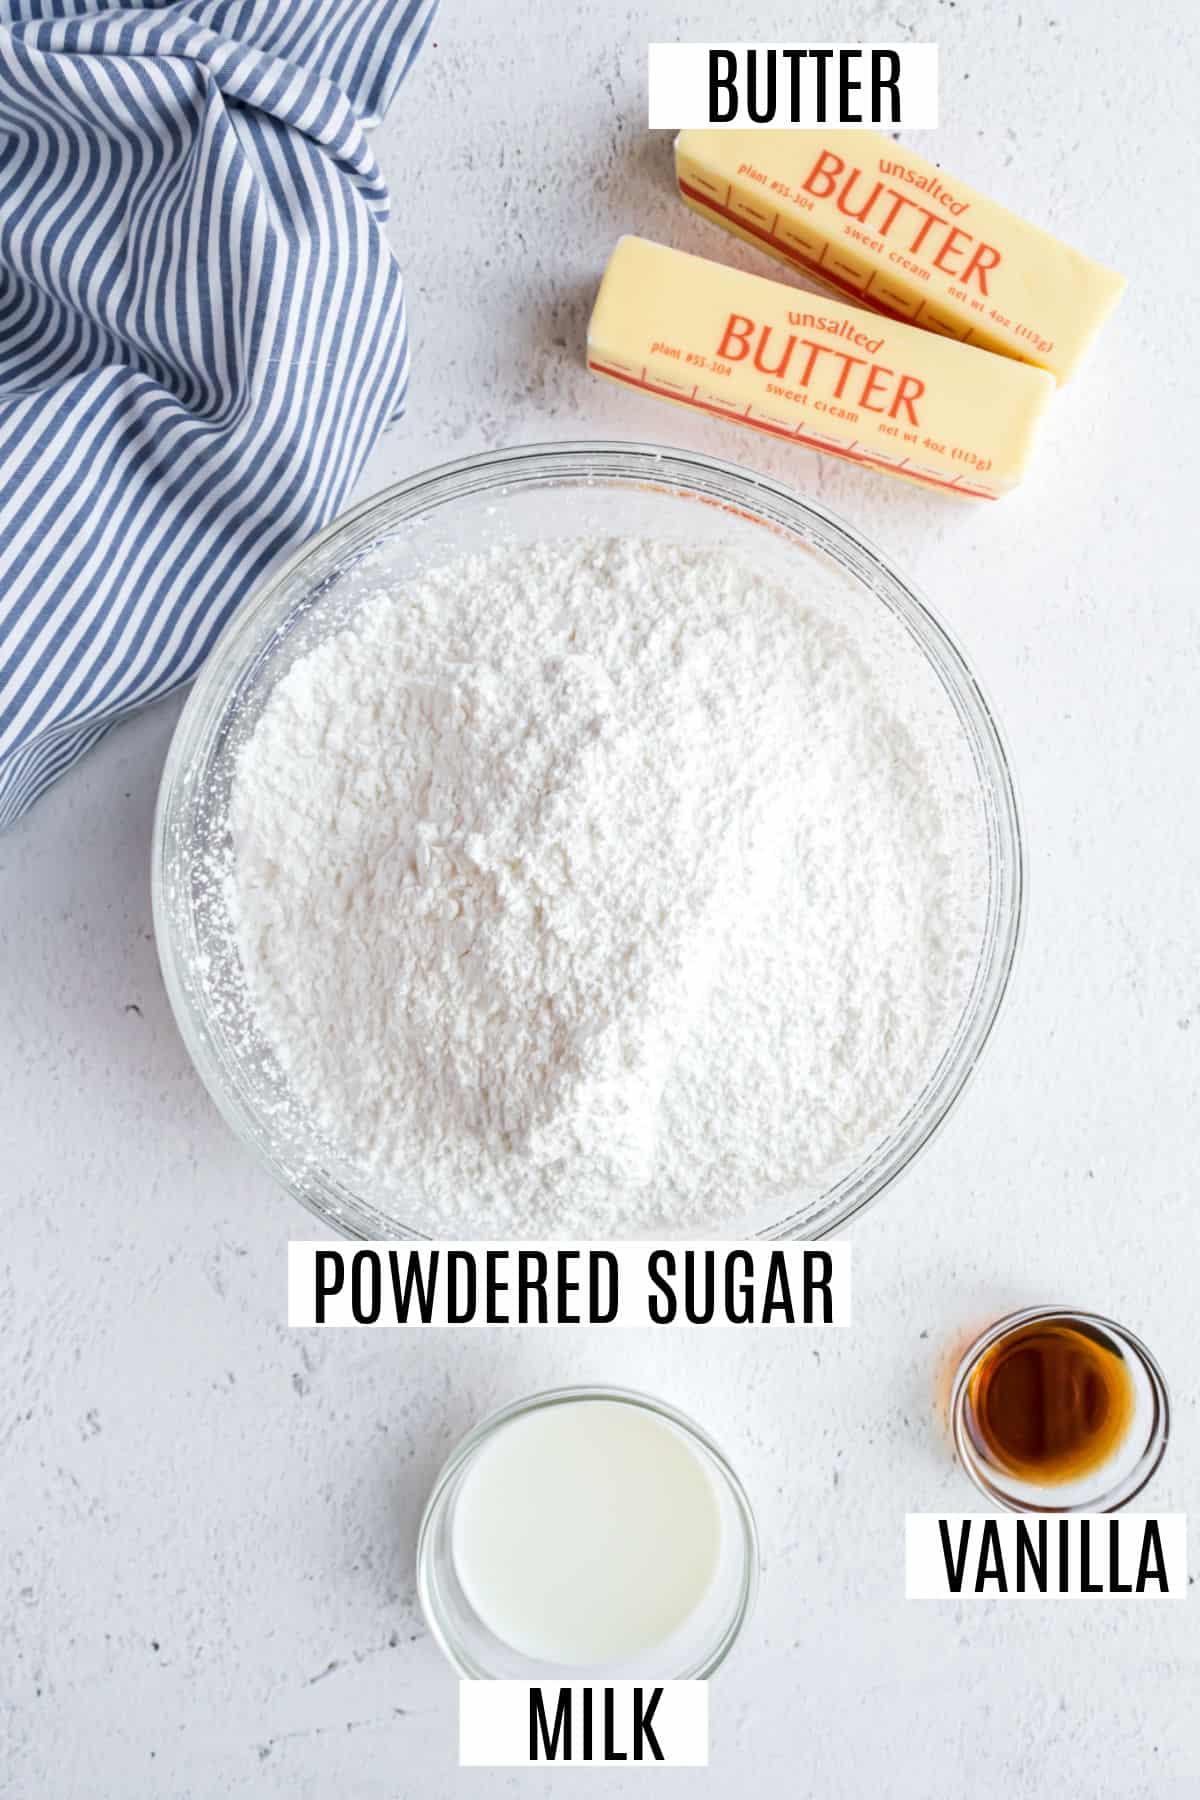 Four ingredients to make vanilla buttercram frosting.